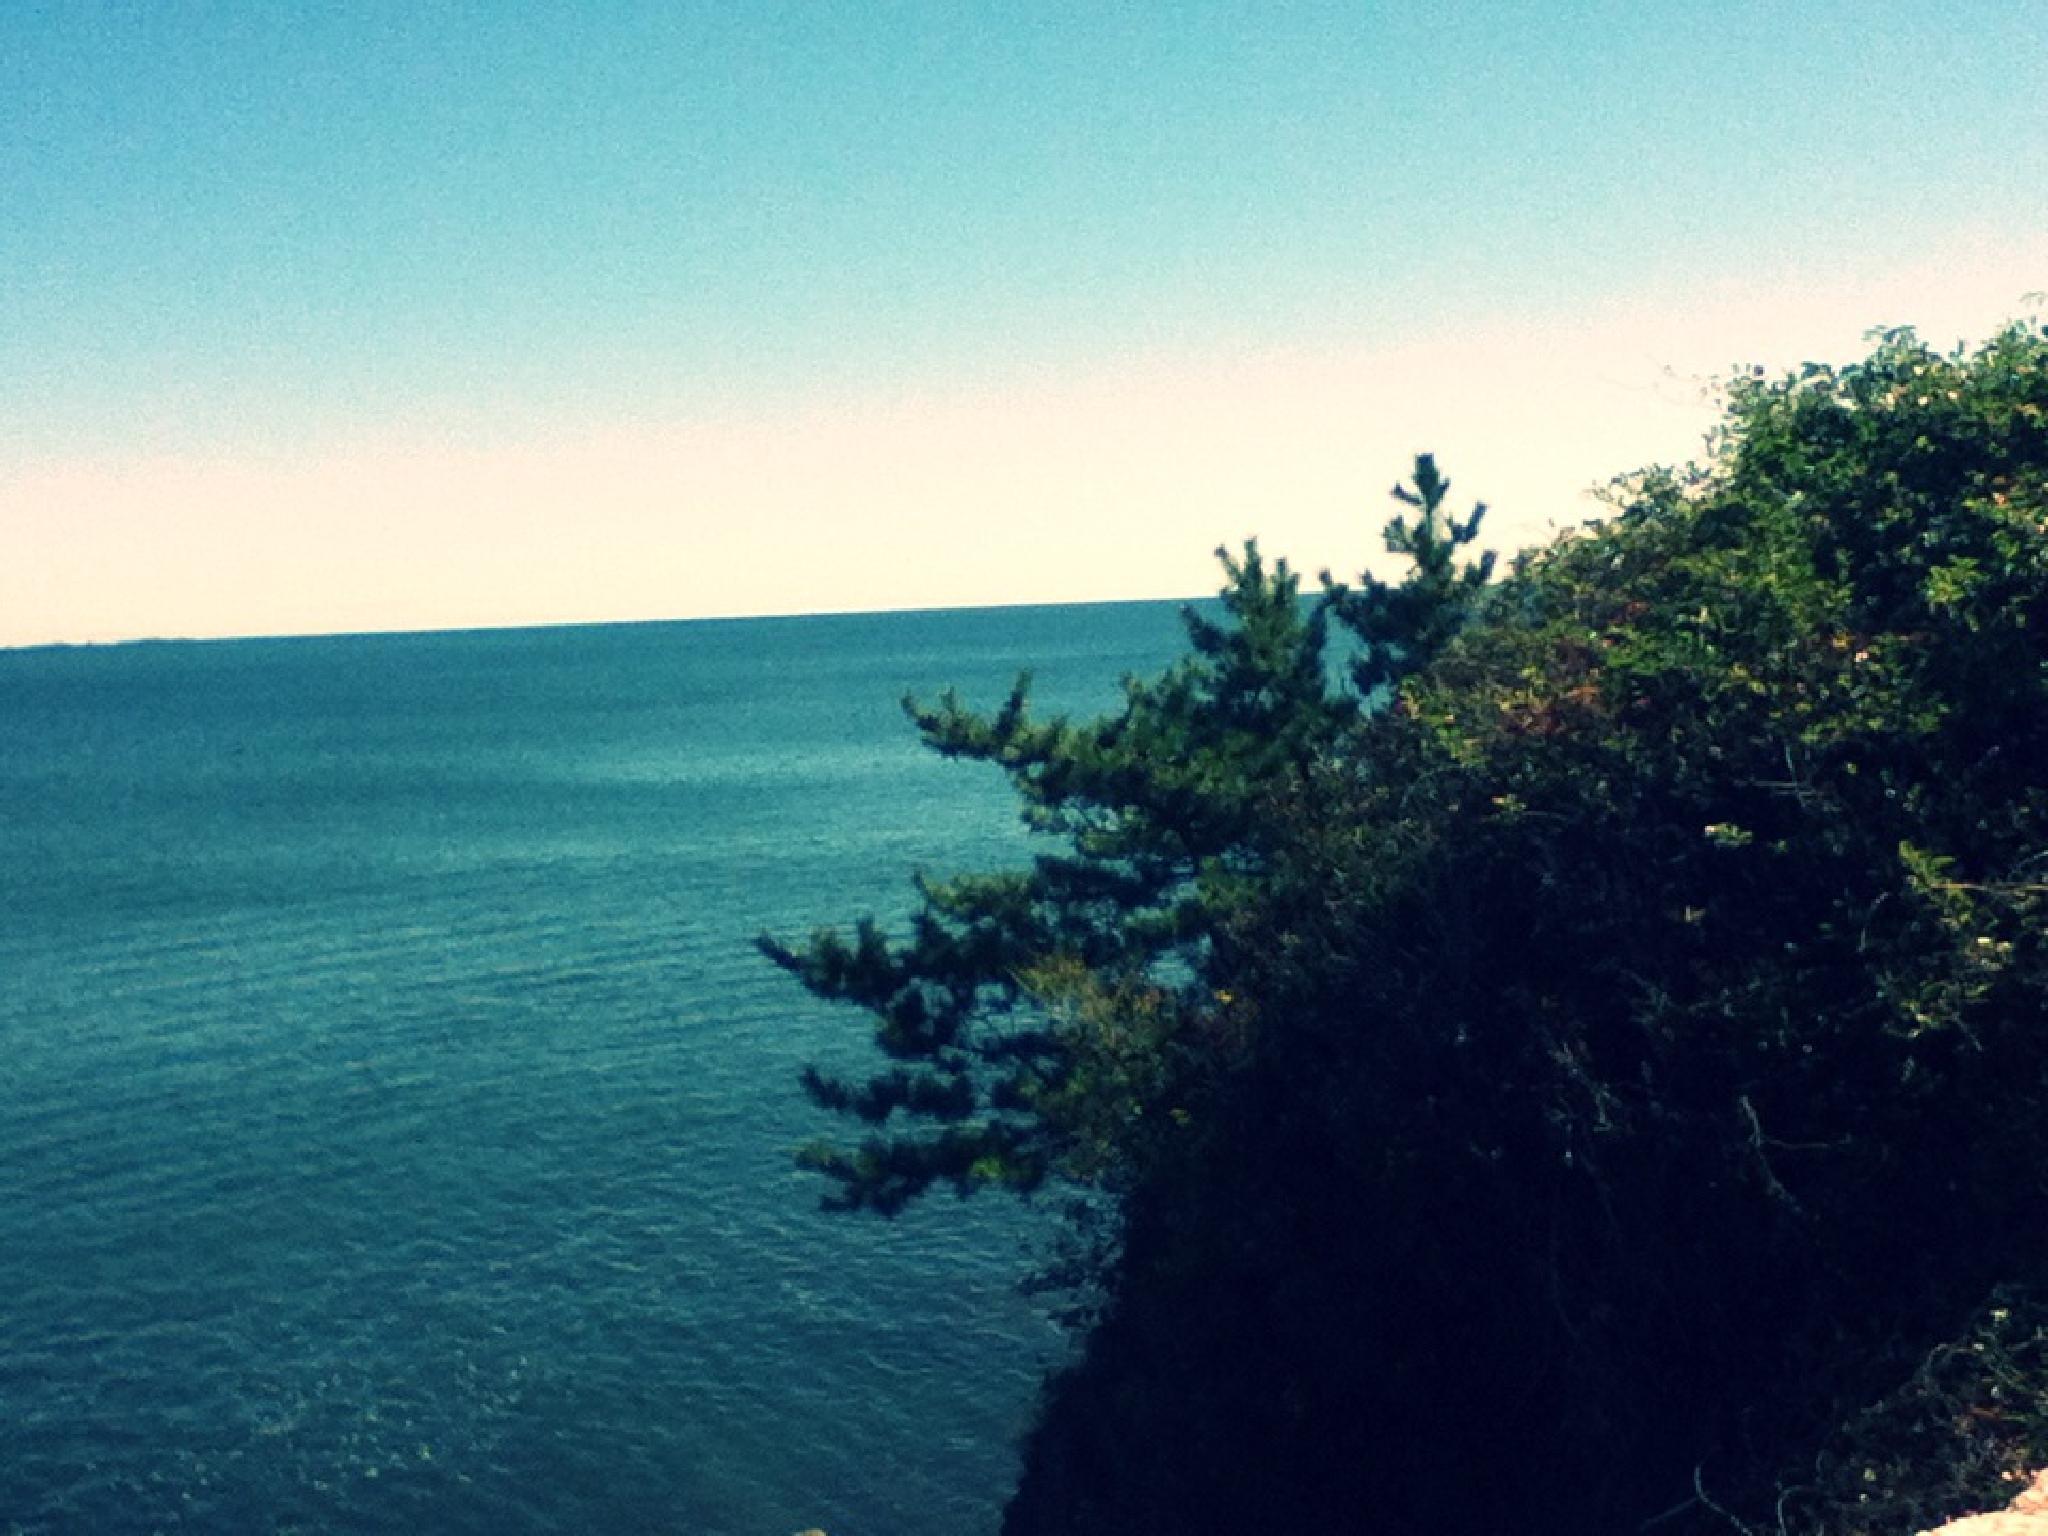 ocean by lifelover